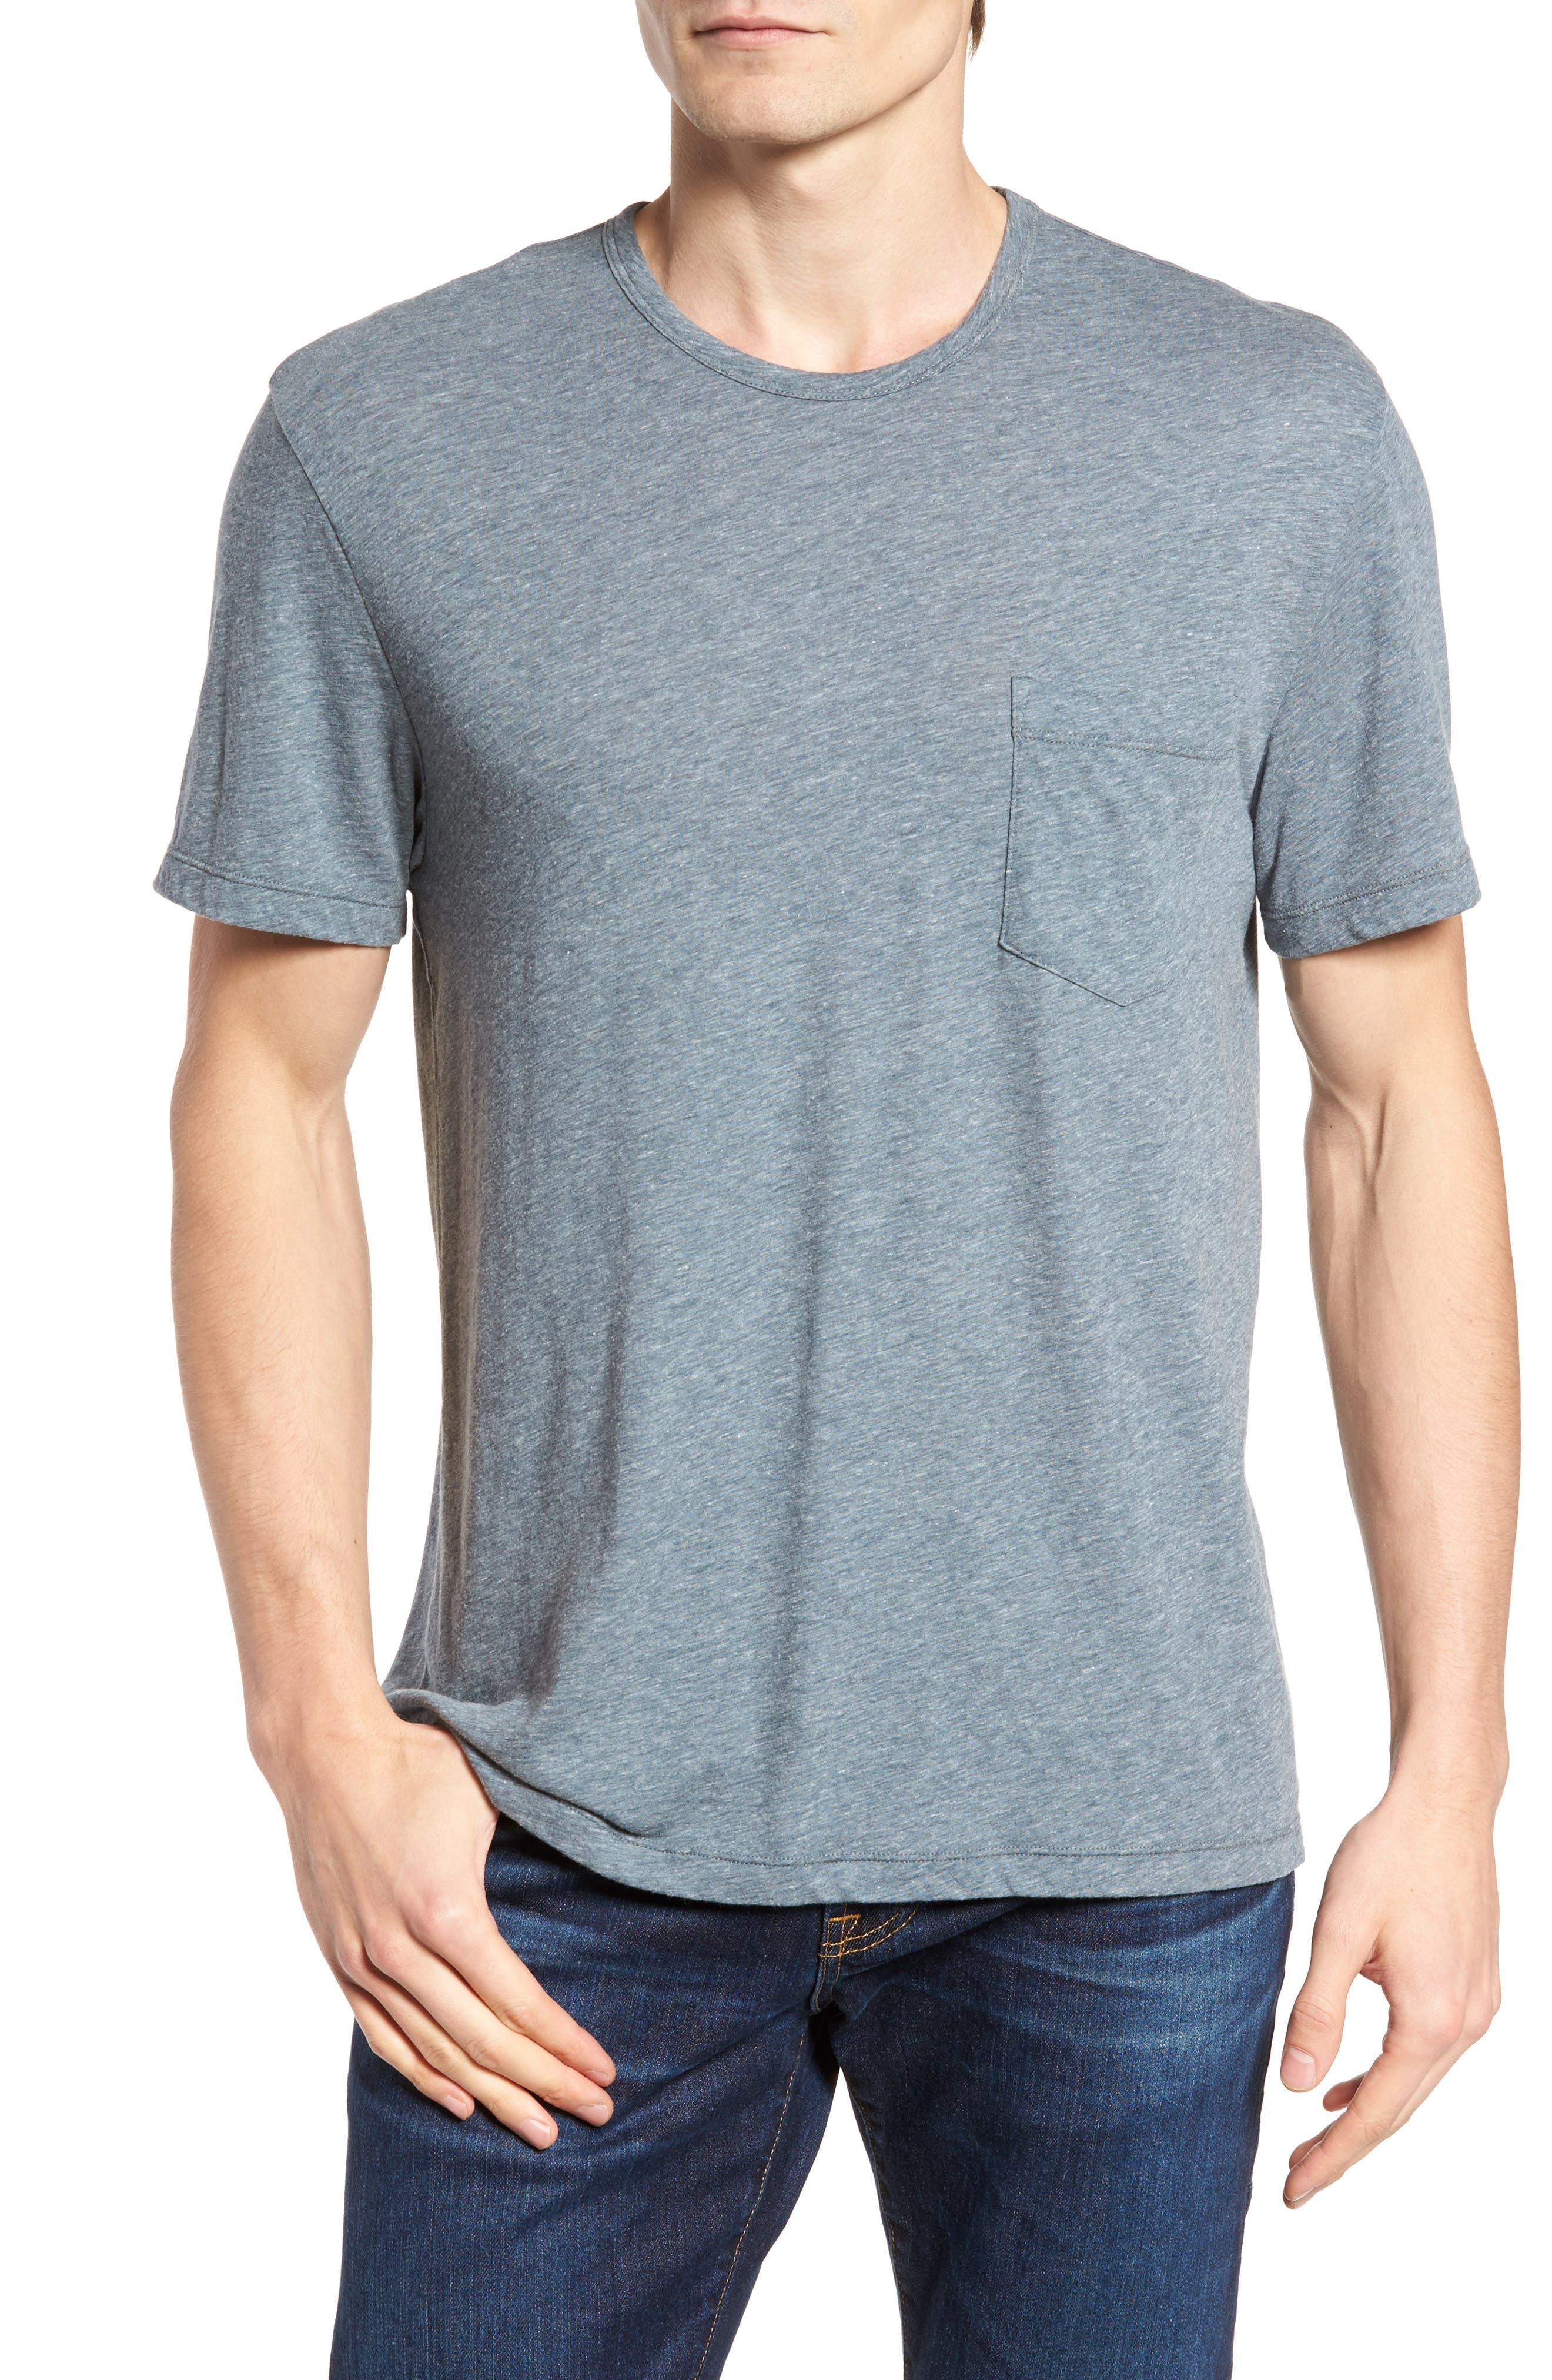 Alternate Image 1 Selected - James Perse Slubbed Cotton & Linen Pocket T-Shirt